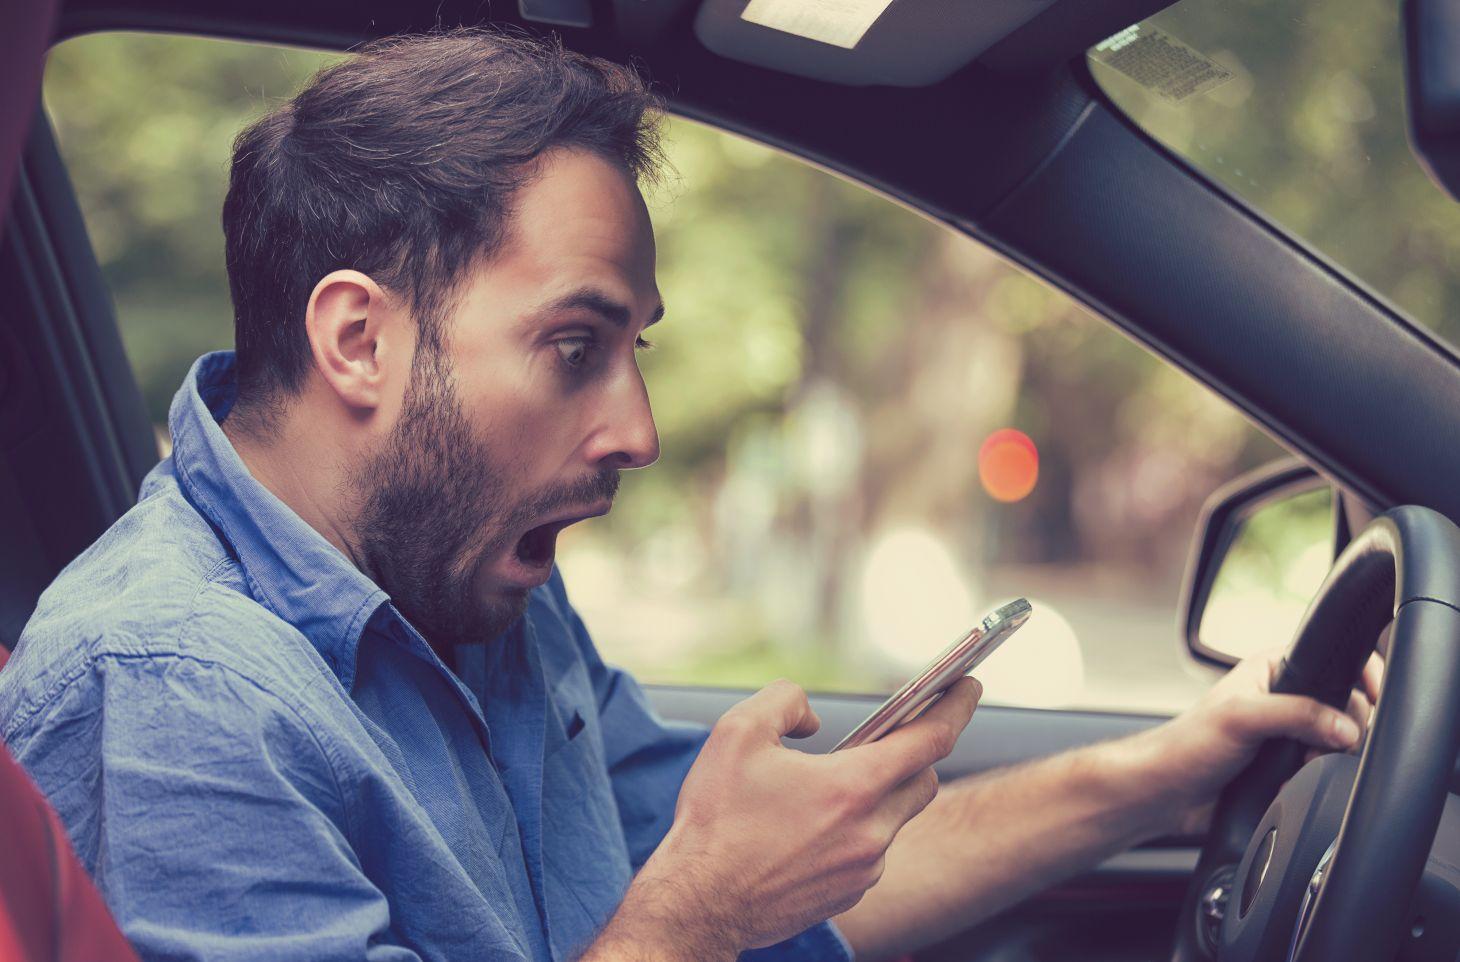 motorista surpreso com celular